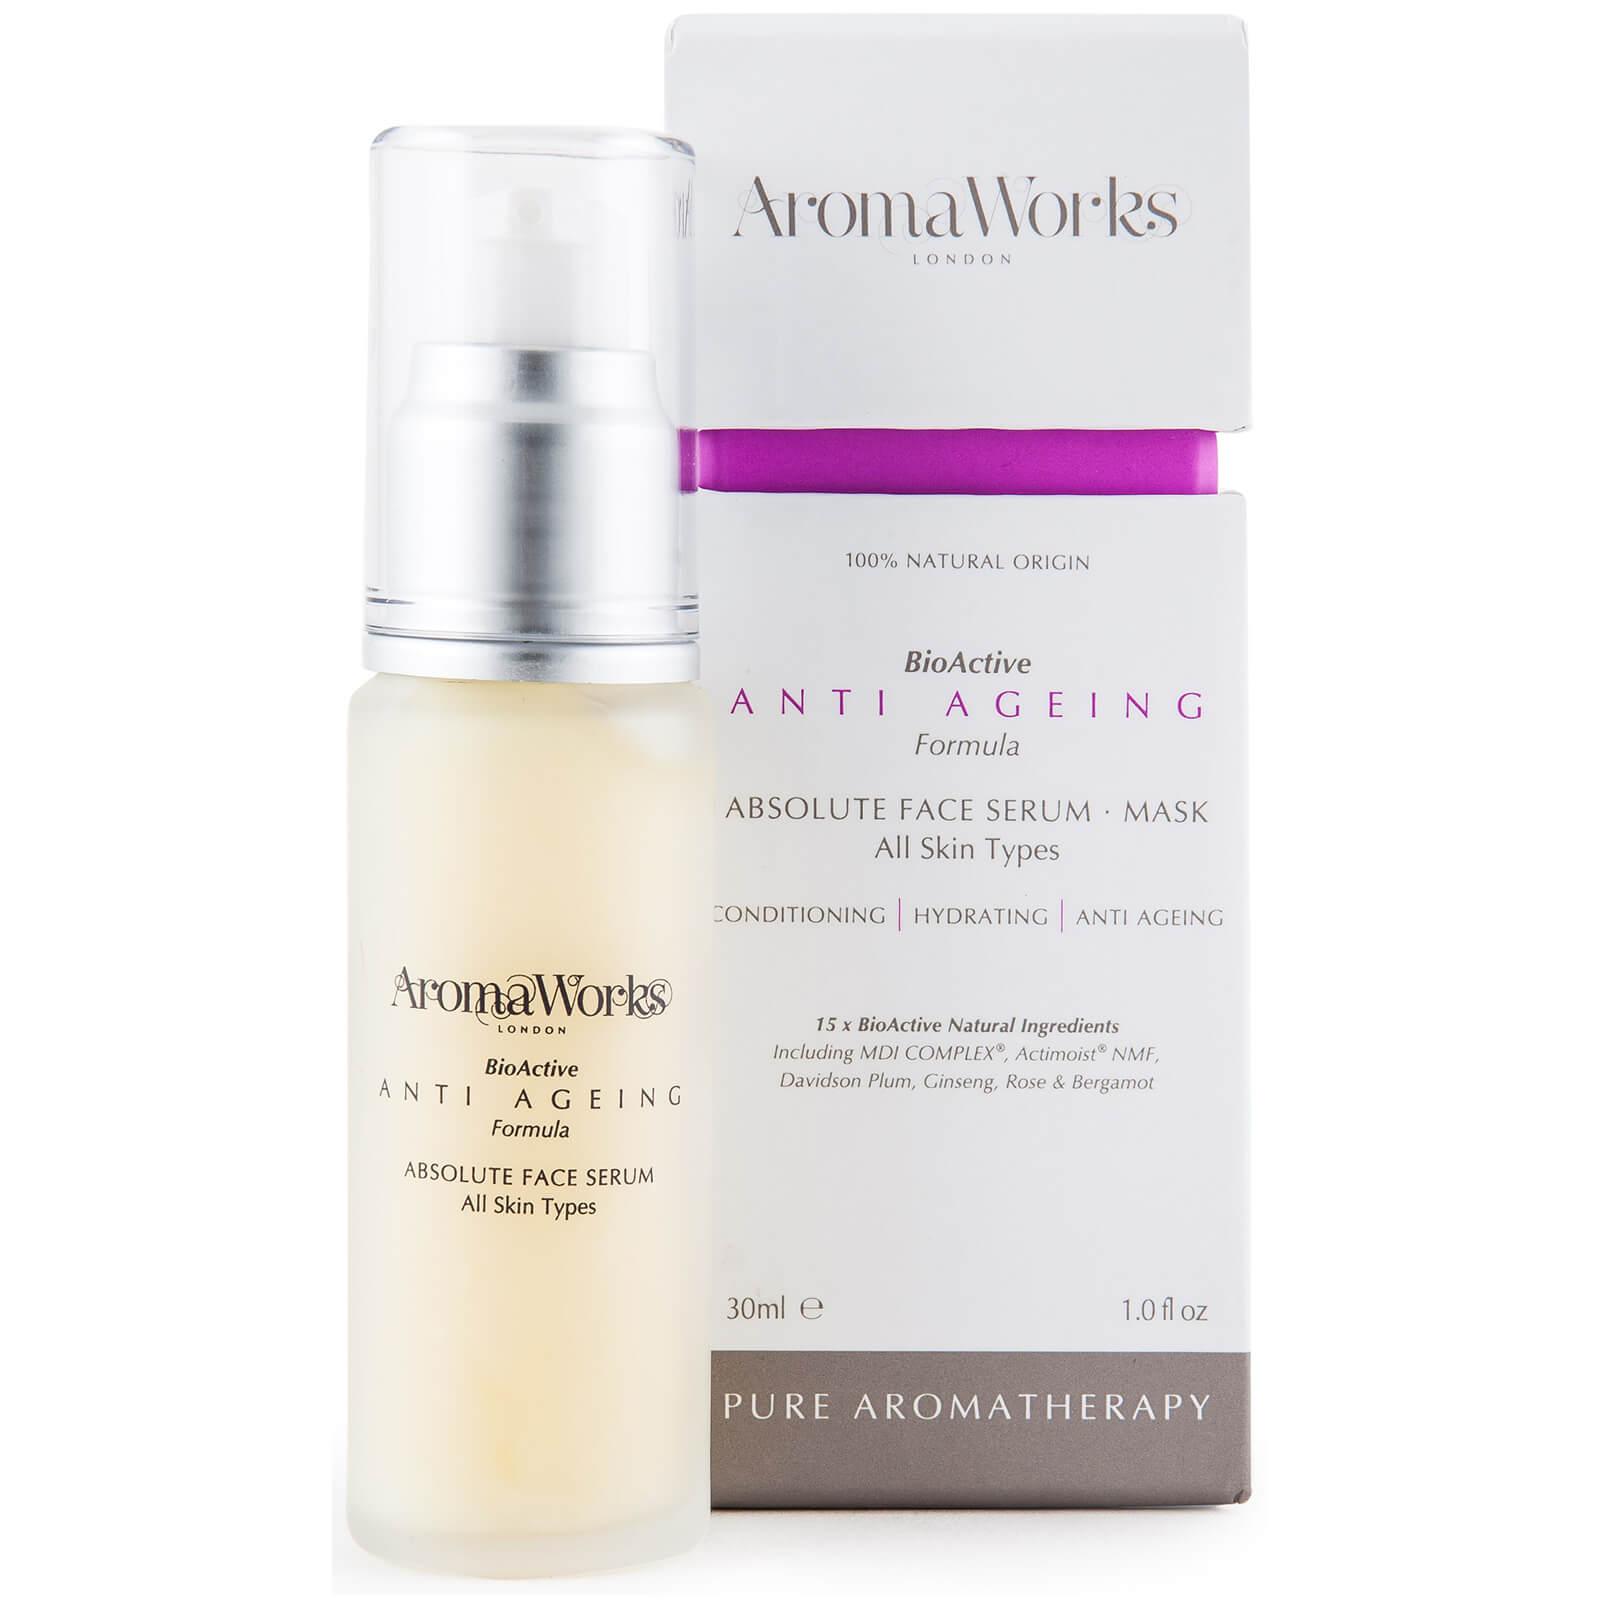 Aromaworks Absolute Face Serum 30ml Beautyexpert Vampire Original Thailand Product Description